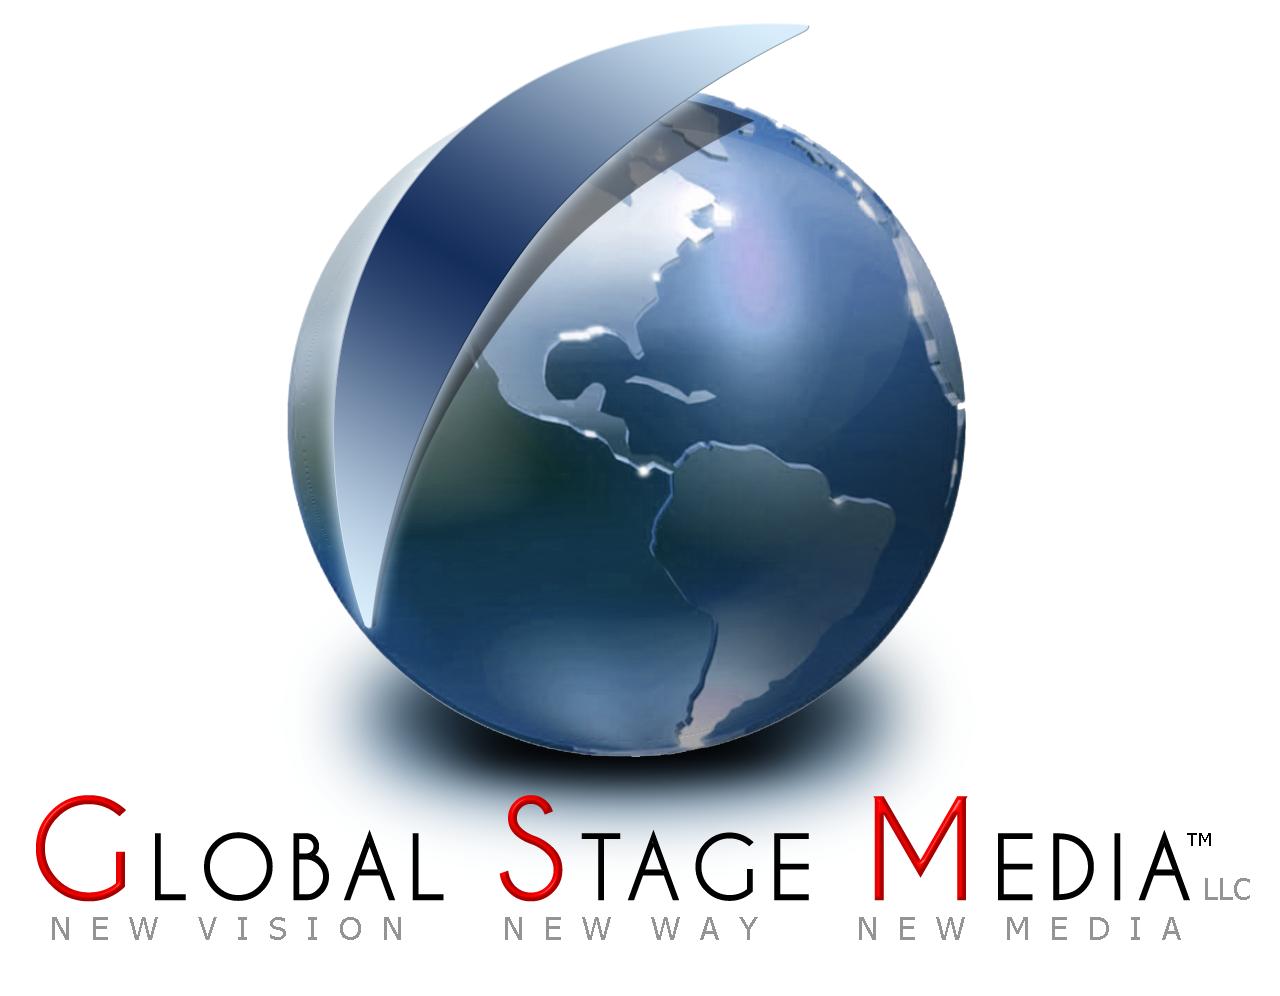 Global Stage Media, LLC logo